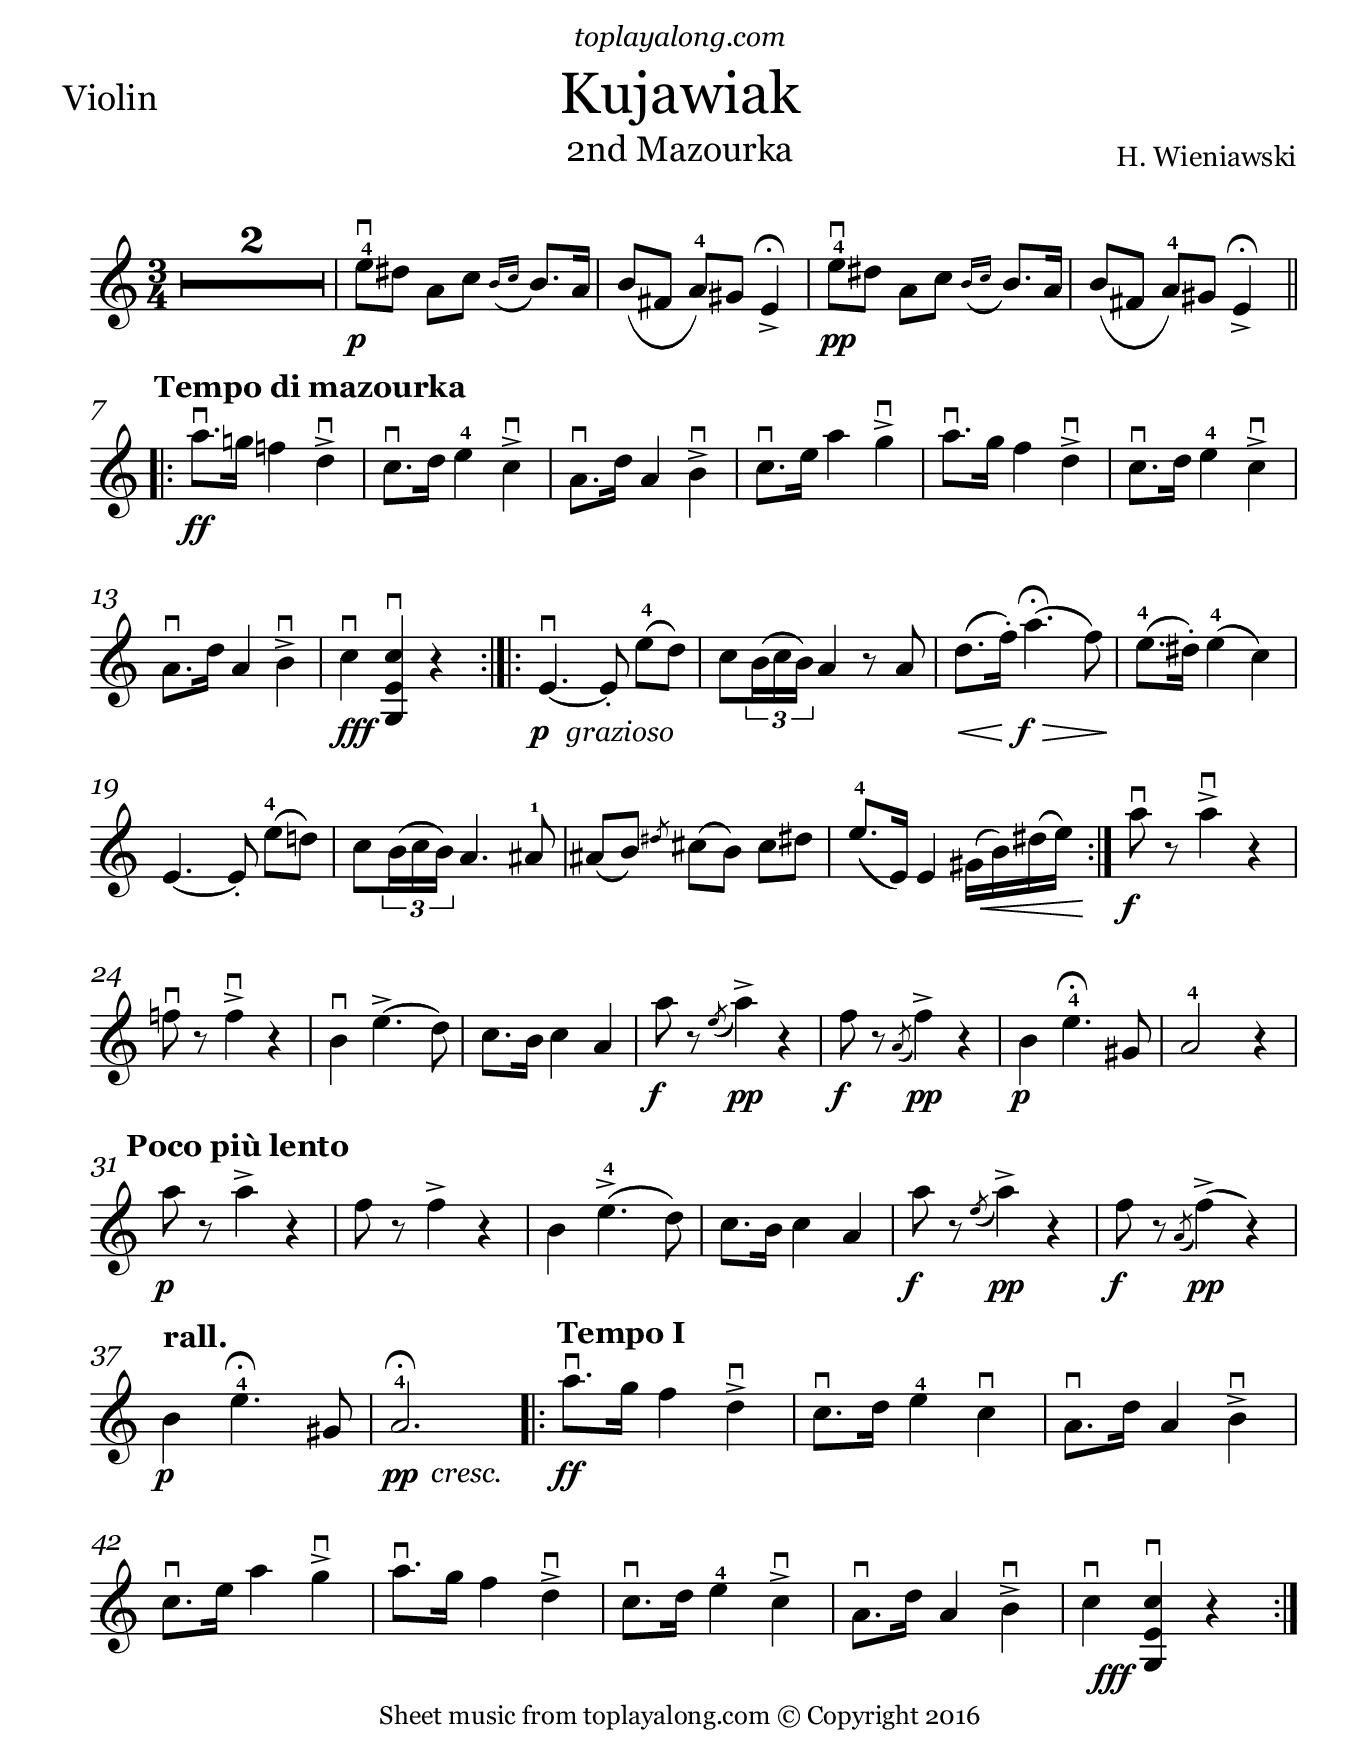 Kujawiak in A minor by Wieniawski. Sheet music for Violin, page 1.